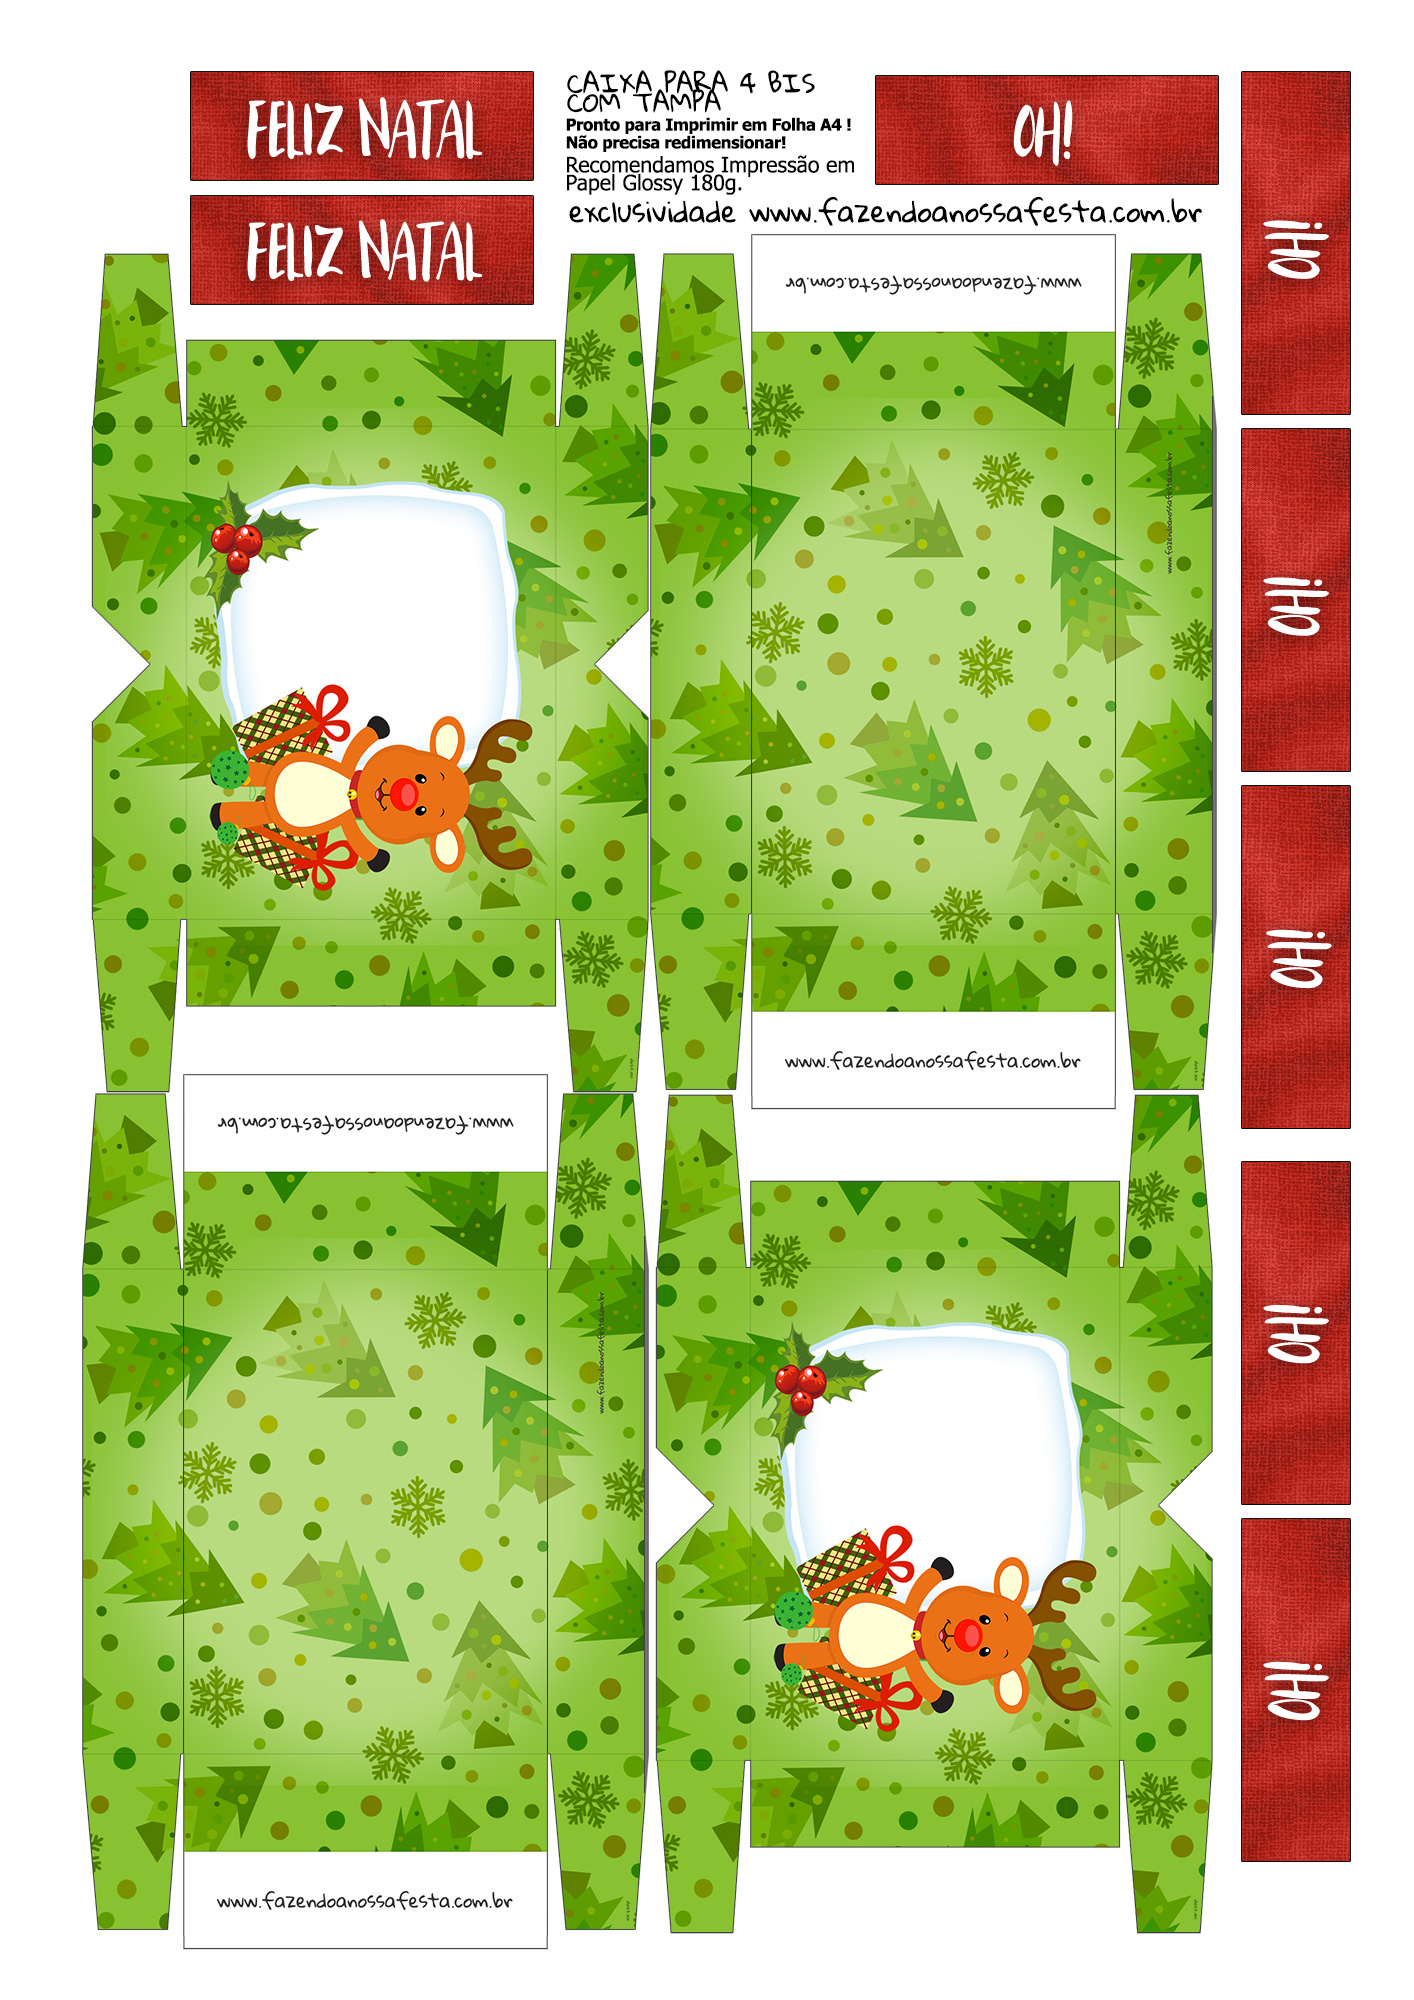 Lembrancinha para Natal Caixa 4 Bis 3